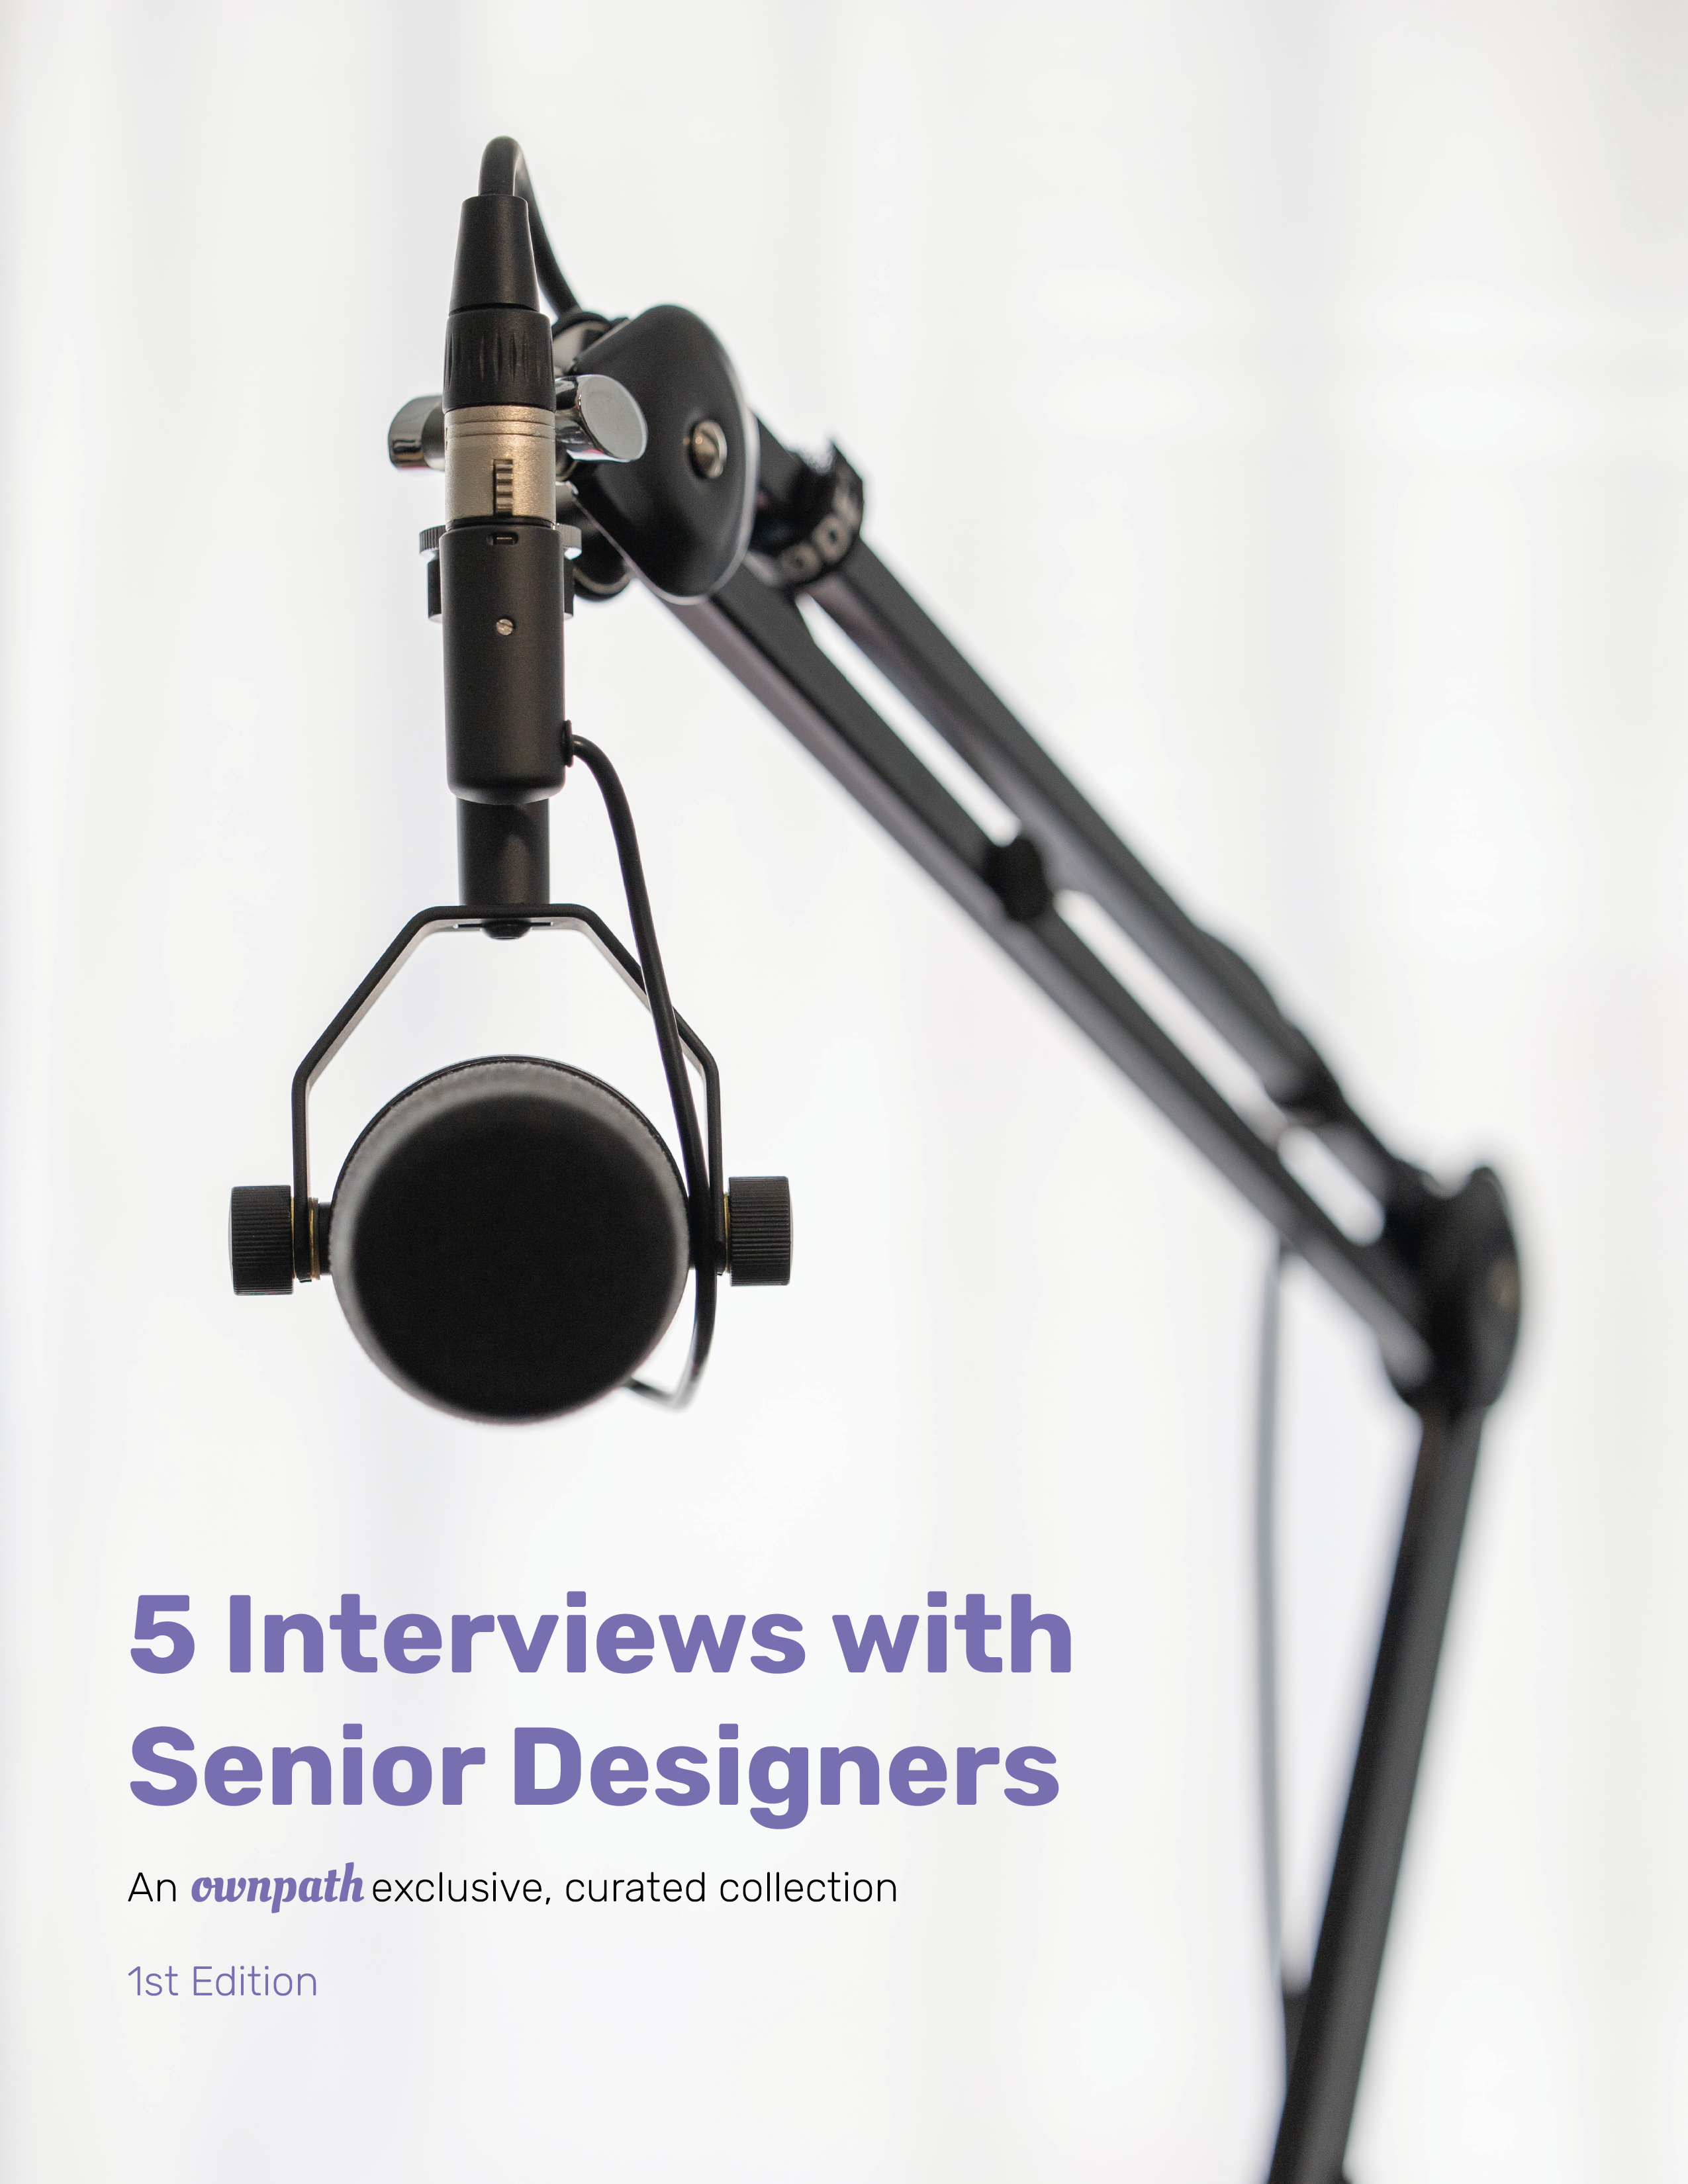 5 interviews with senior designers